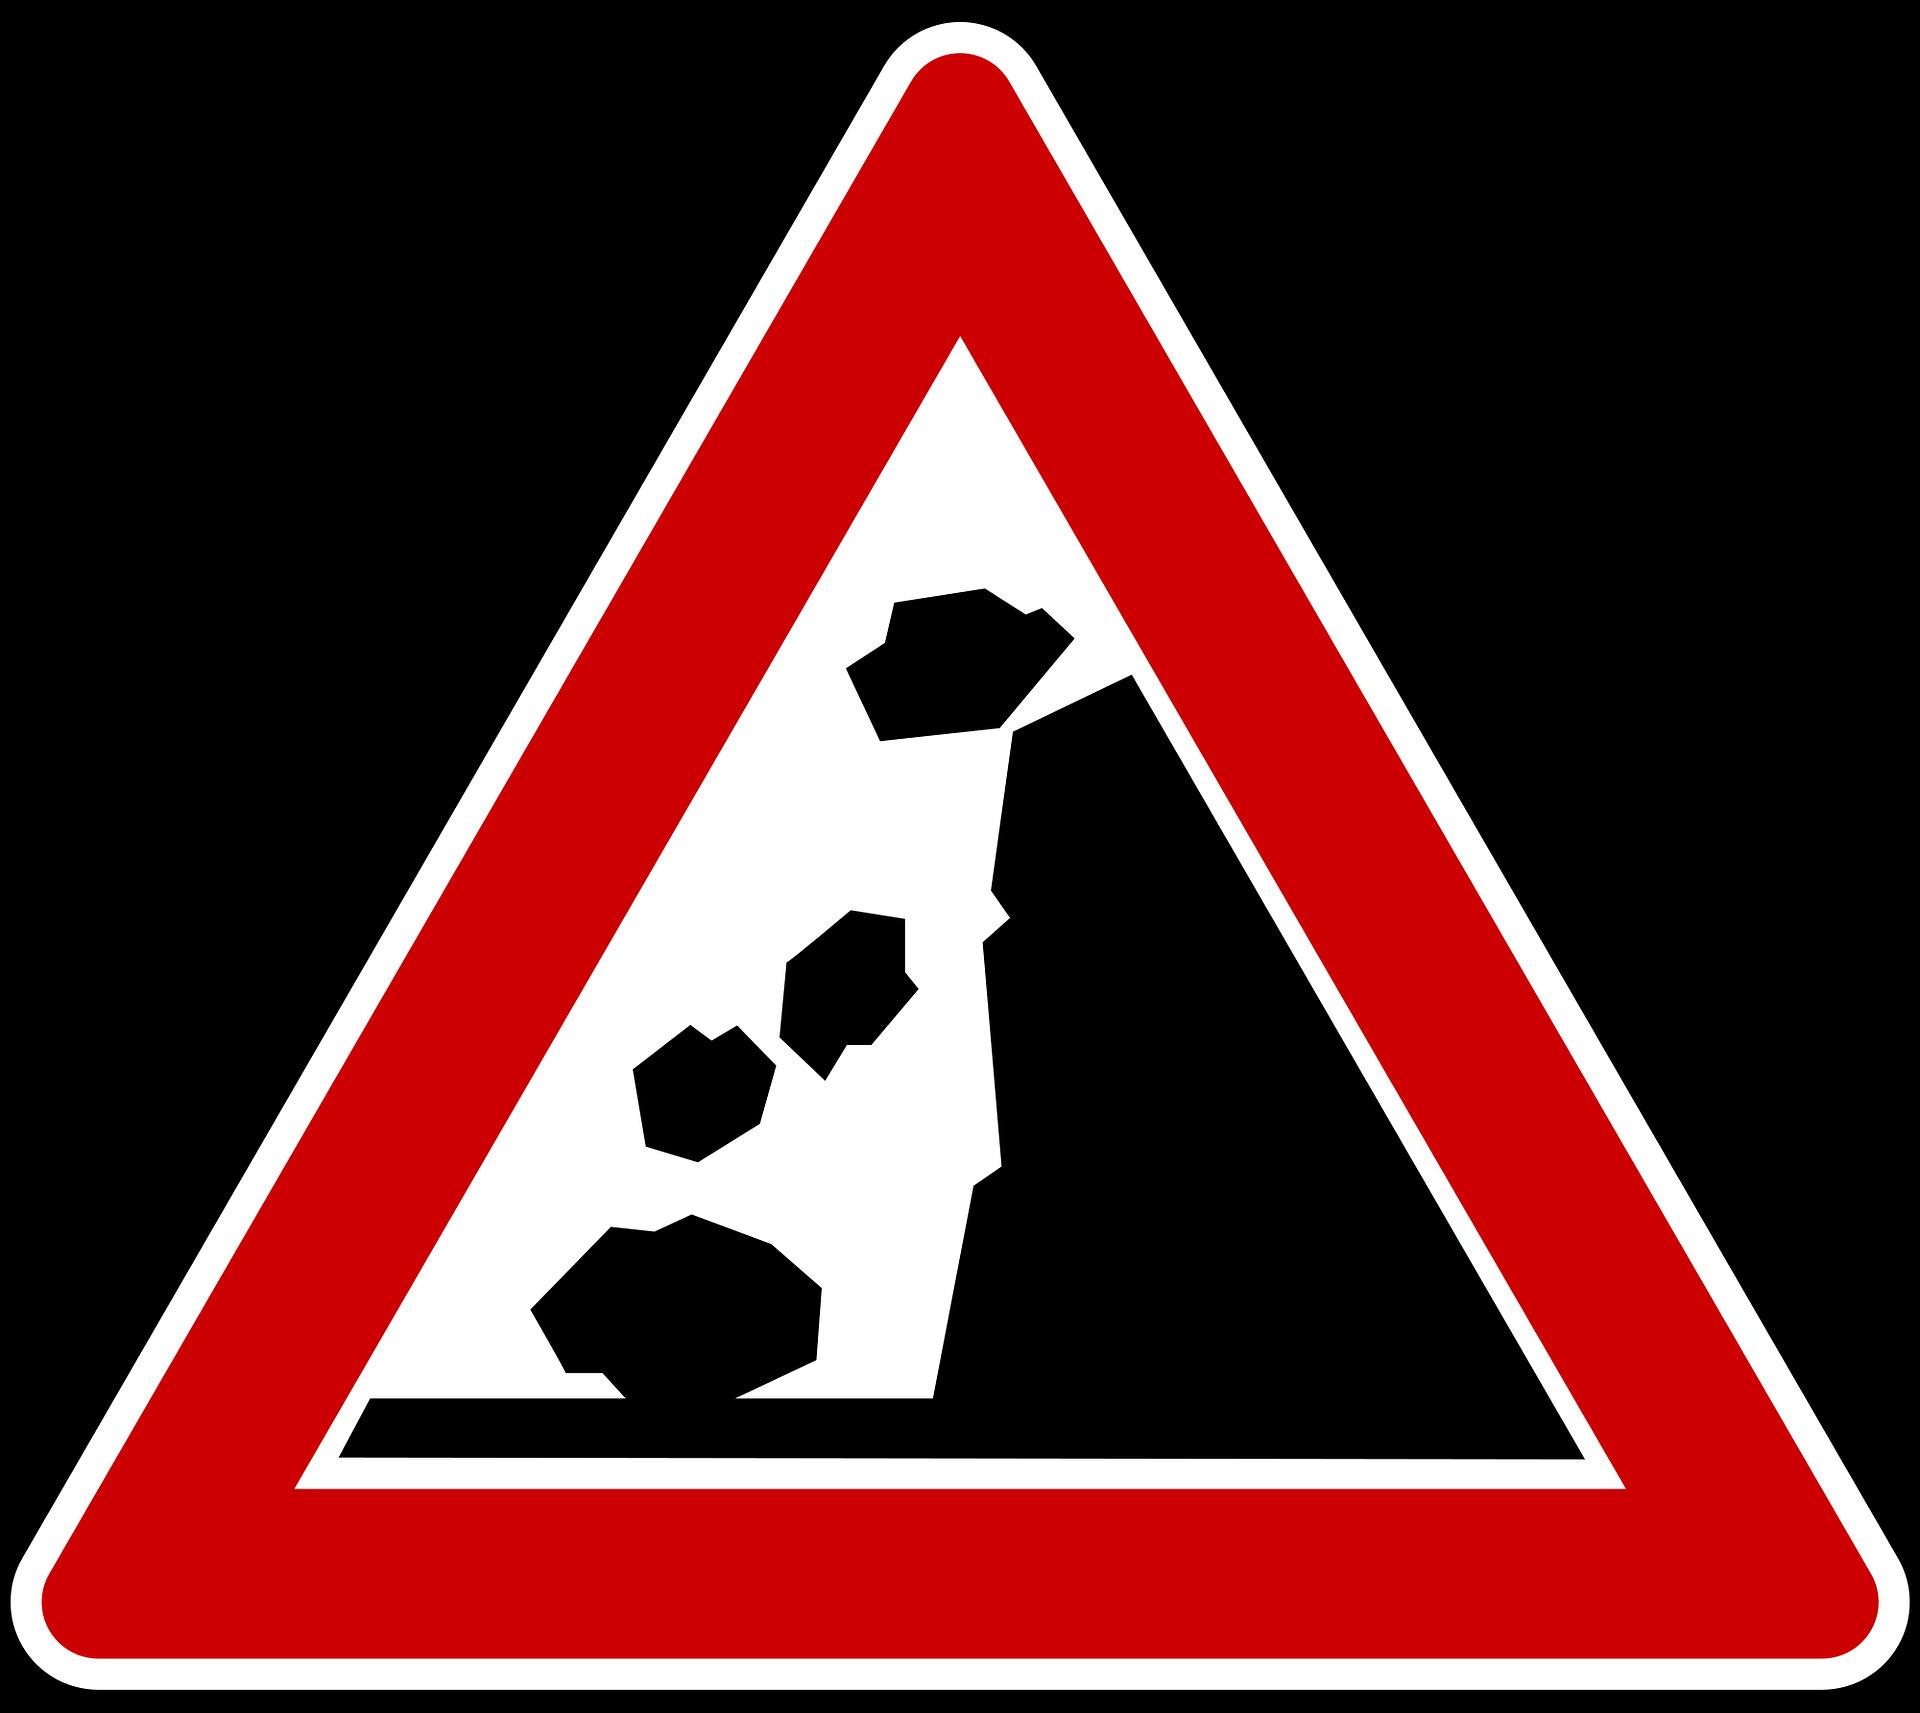 traffic-sign-6679_1920